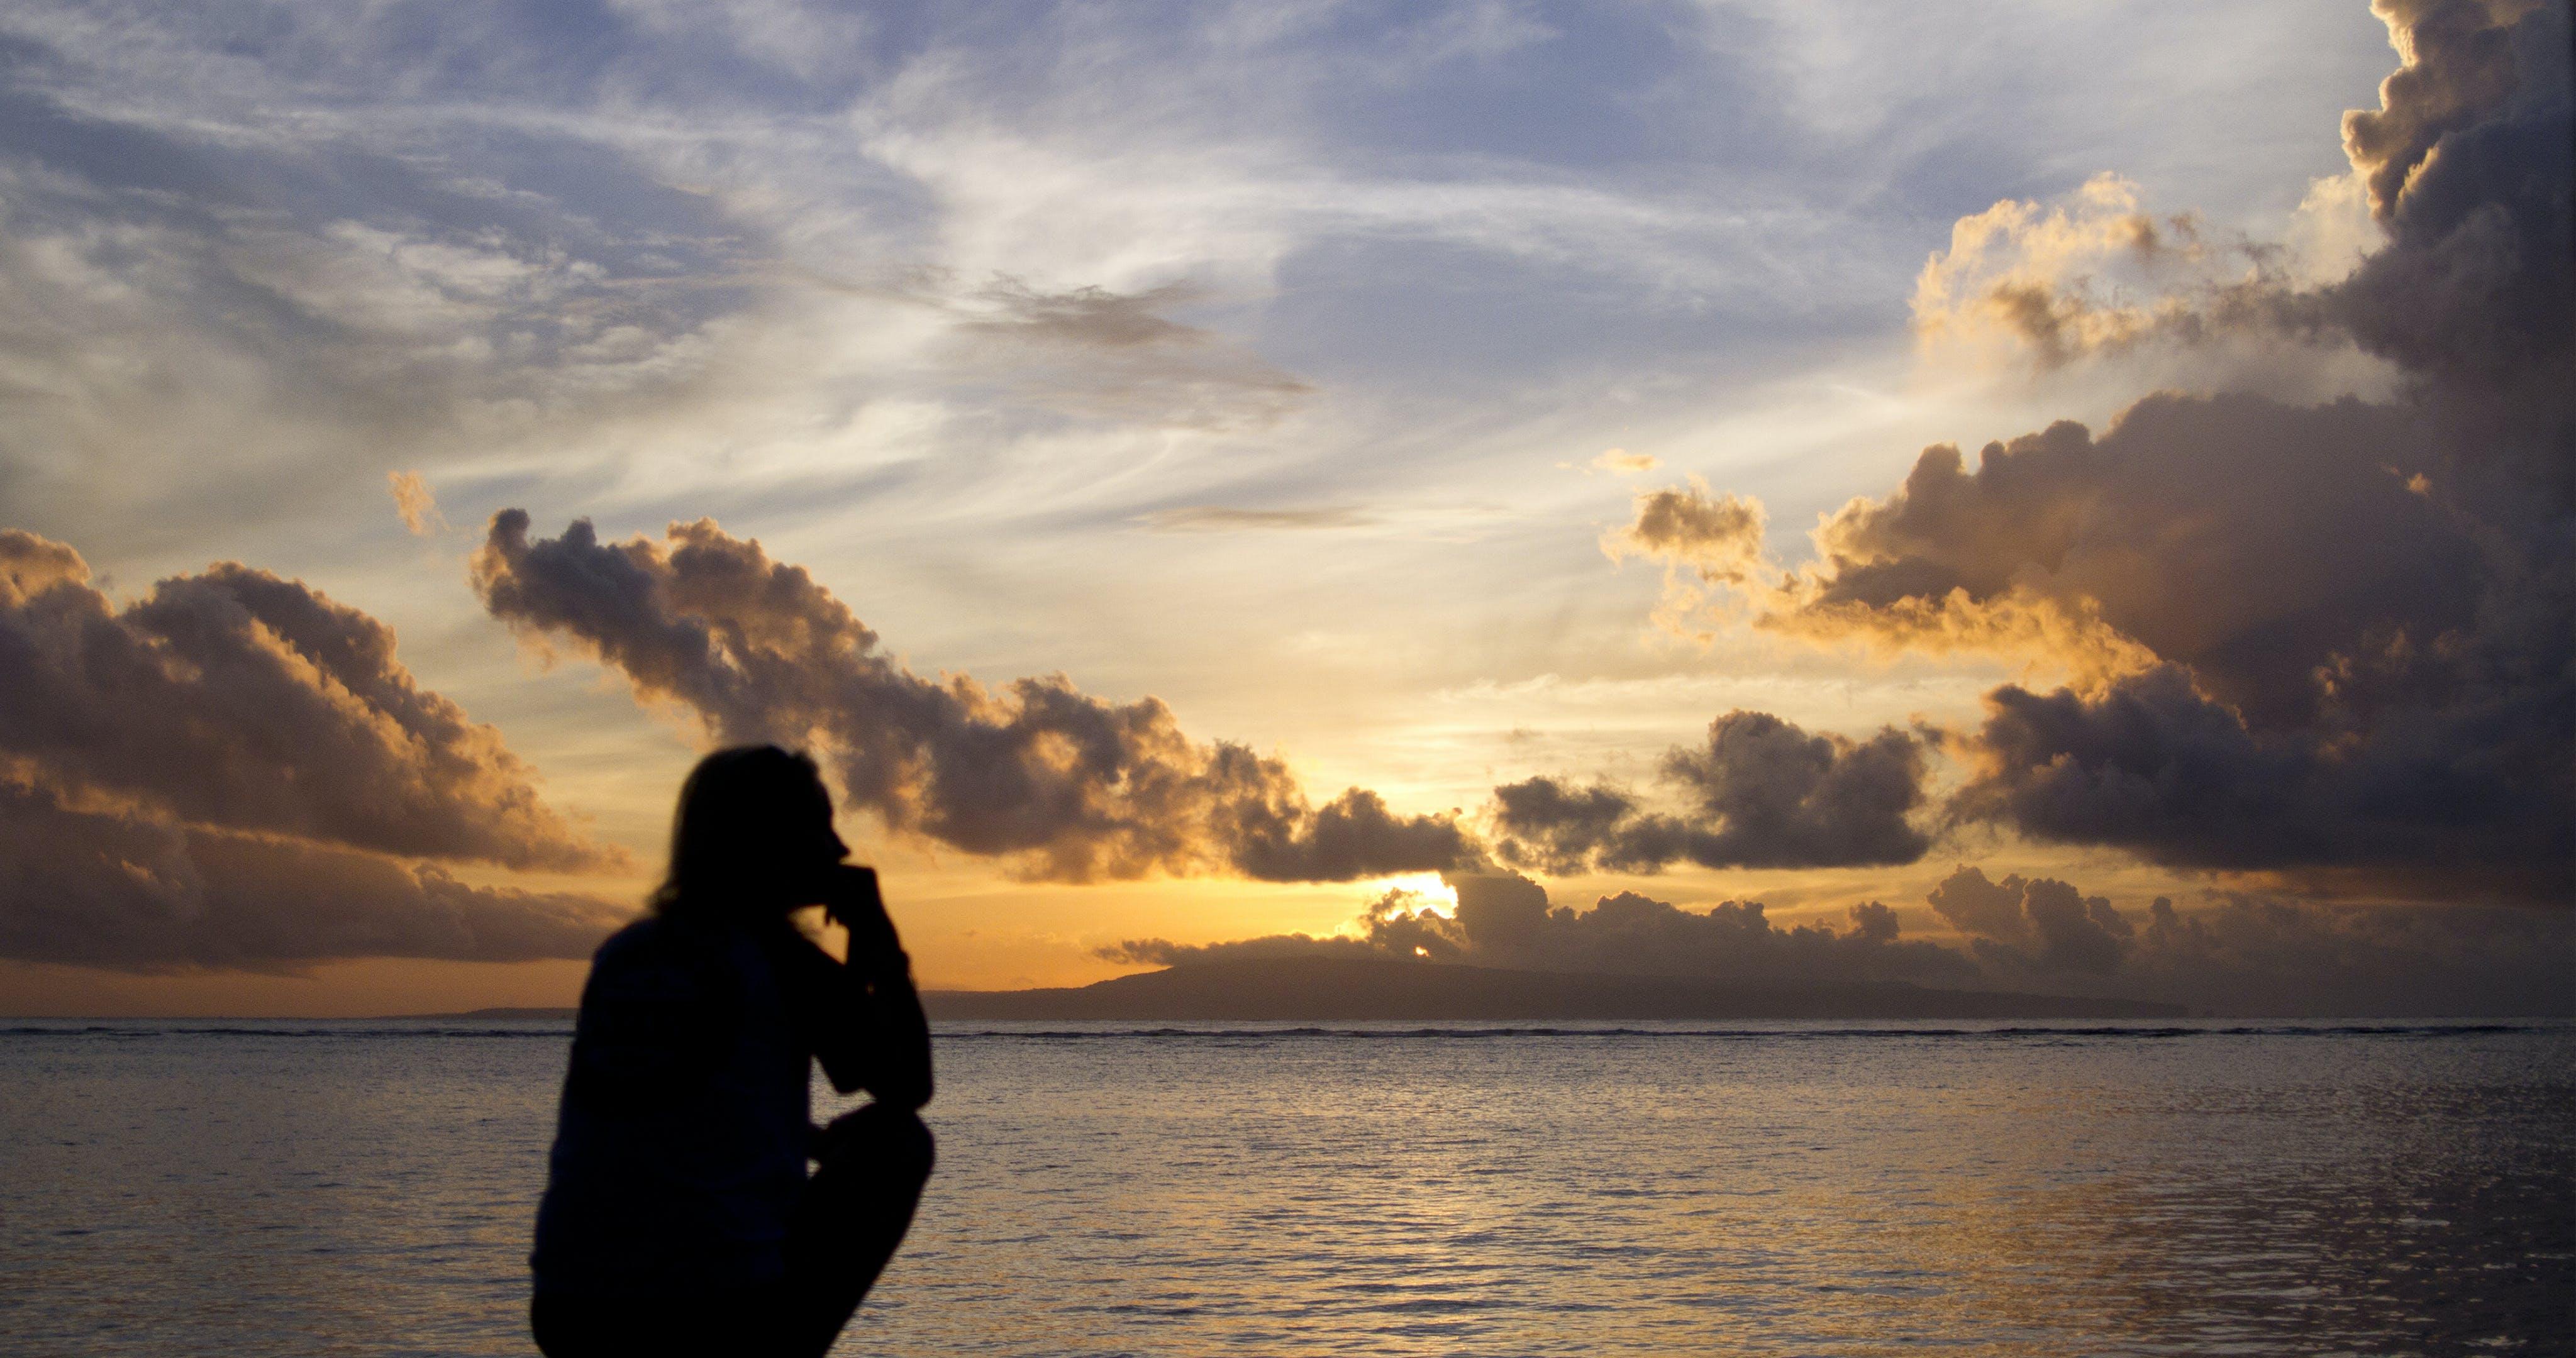 Free stock photo of beach, girl, sunrise, silhouette